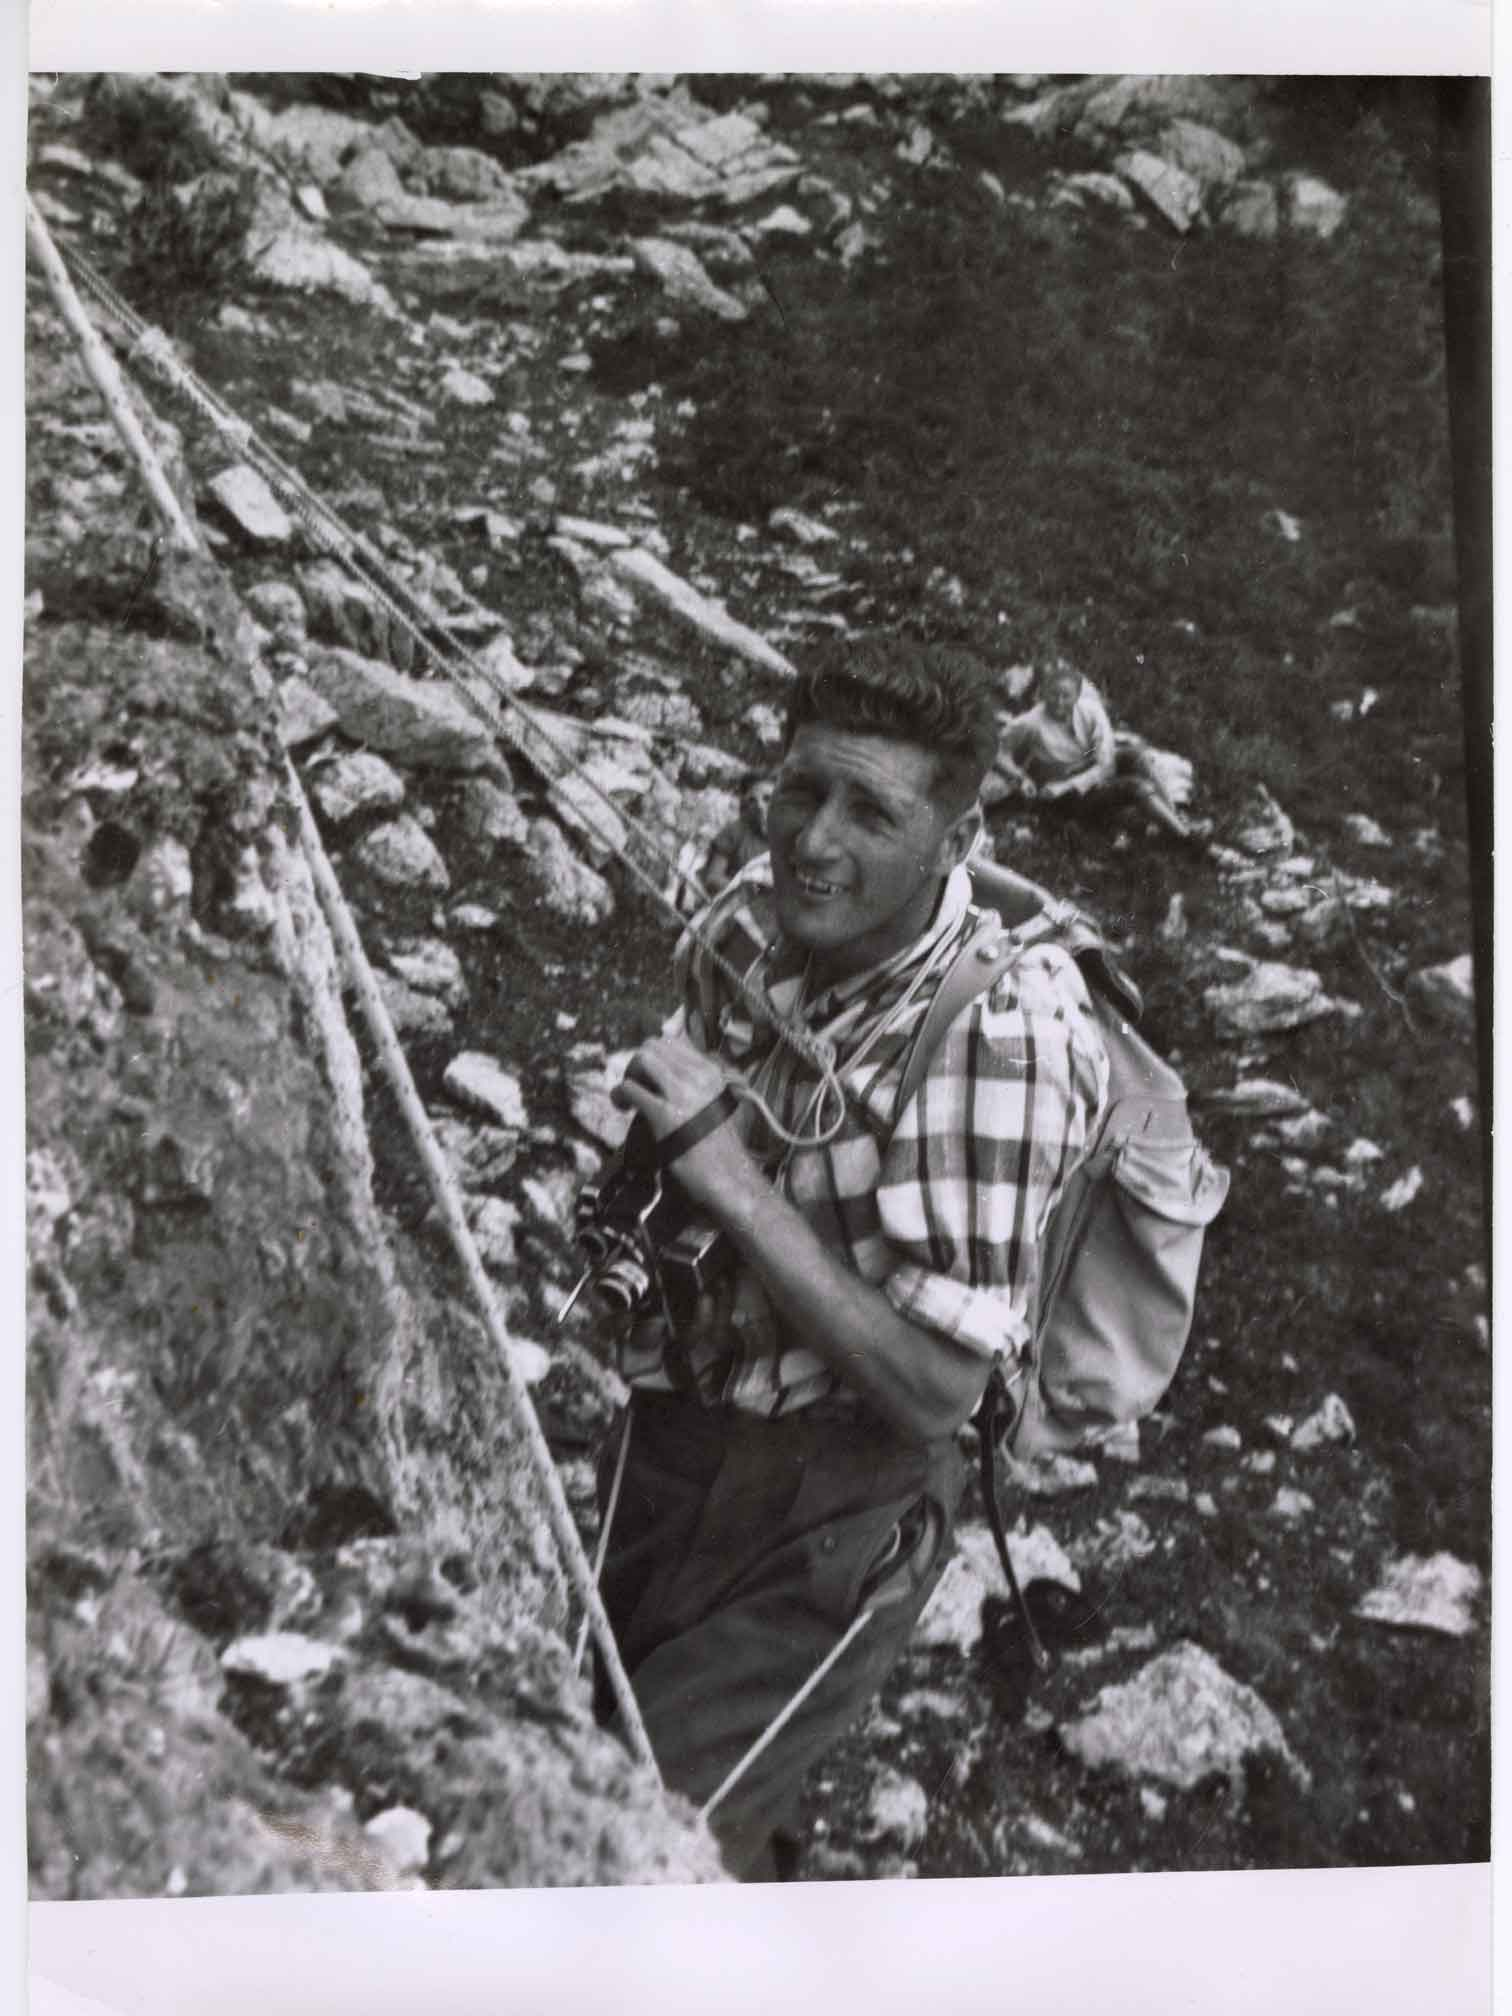 Hans Gmoser, Filmmaking in the Canadian Rockies